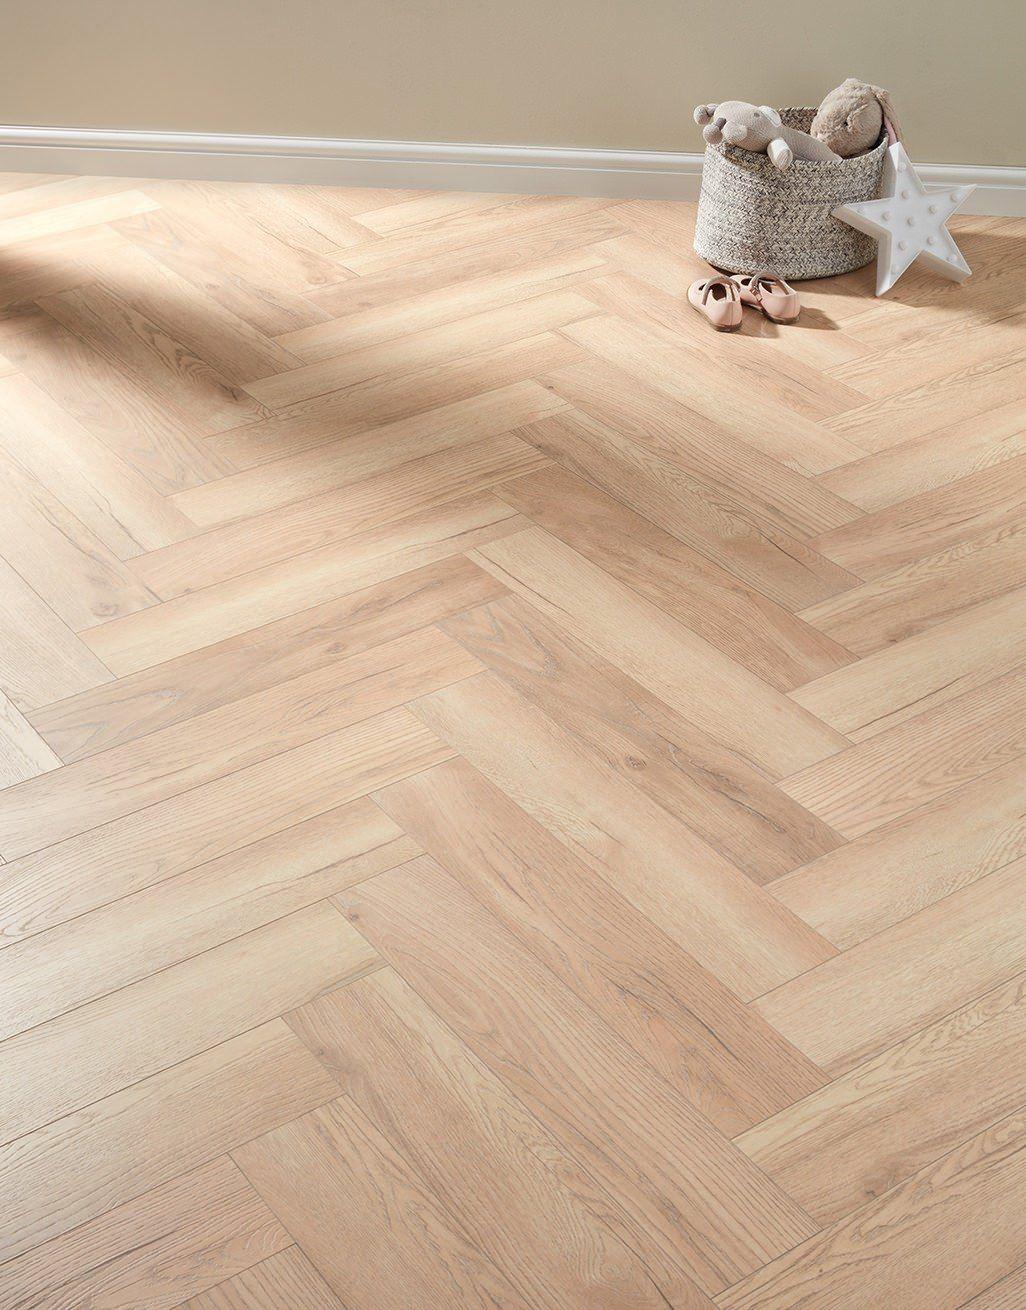 Elegant Oak Laminate Flooring, Herringbone Laminate Flooring